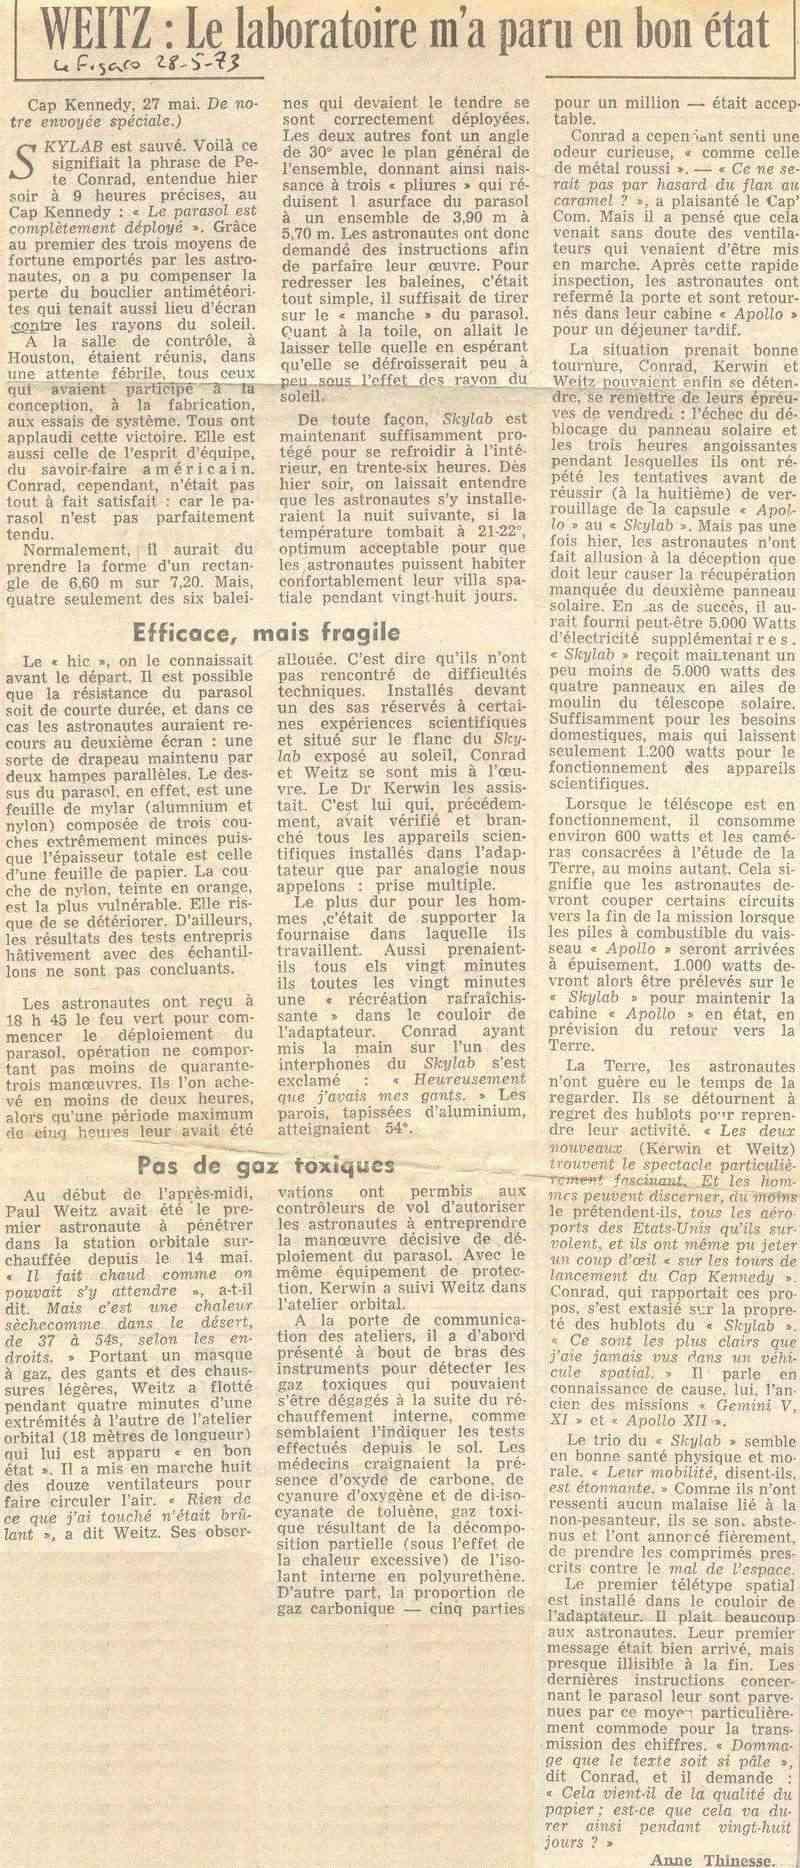 14 mai 1973 - Skylab - Seule station spatiale américaine - Page 2 73052810